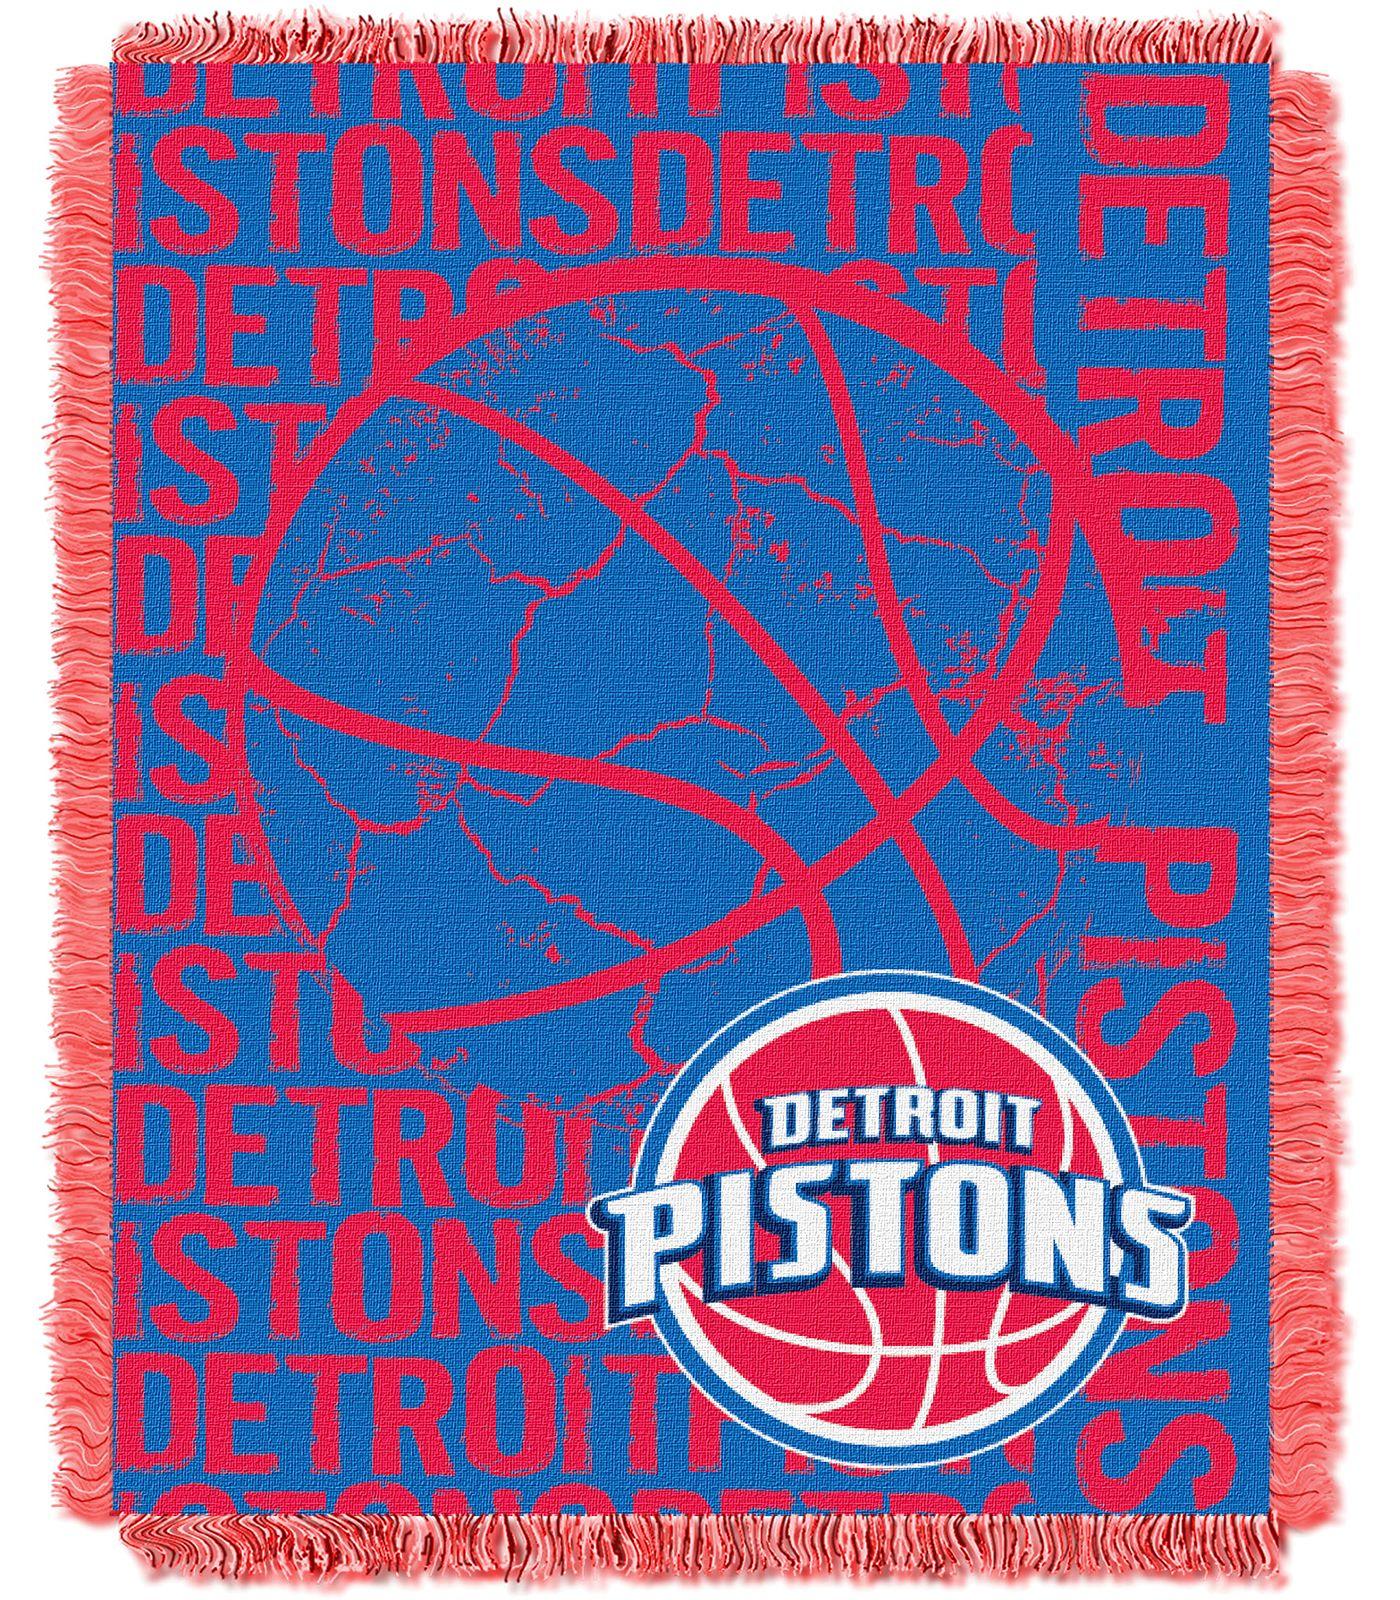 Northwest Detroit Pistons Double Play Blanket